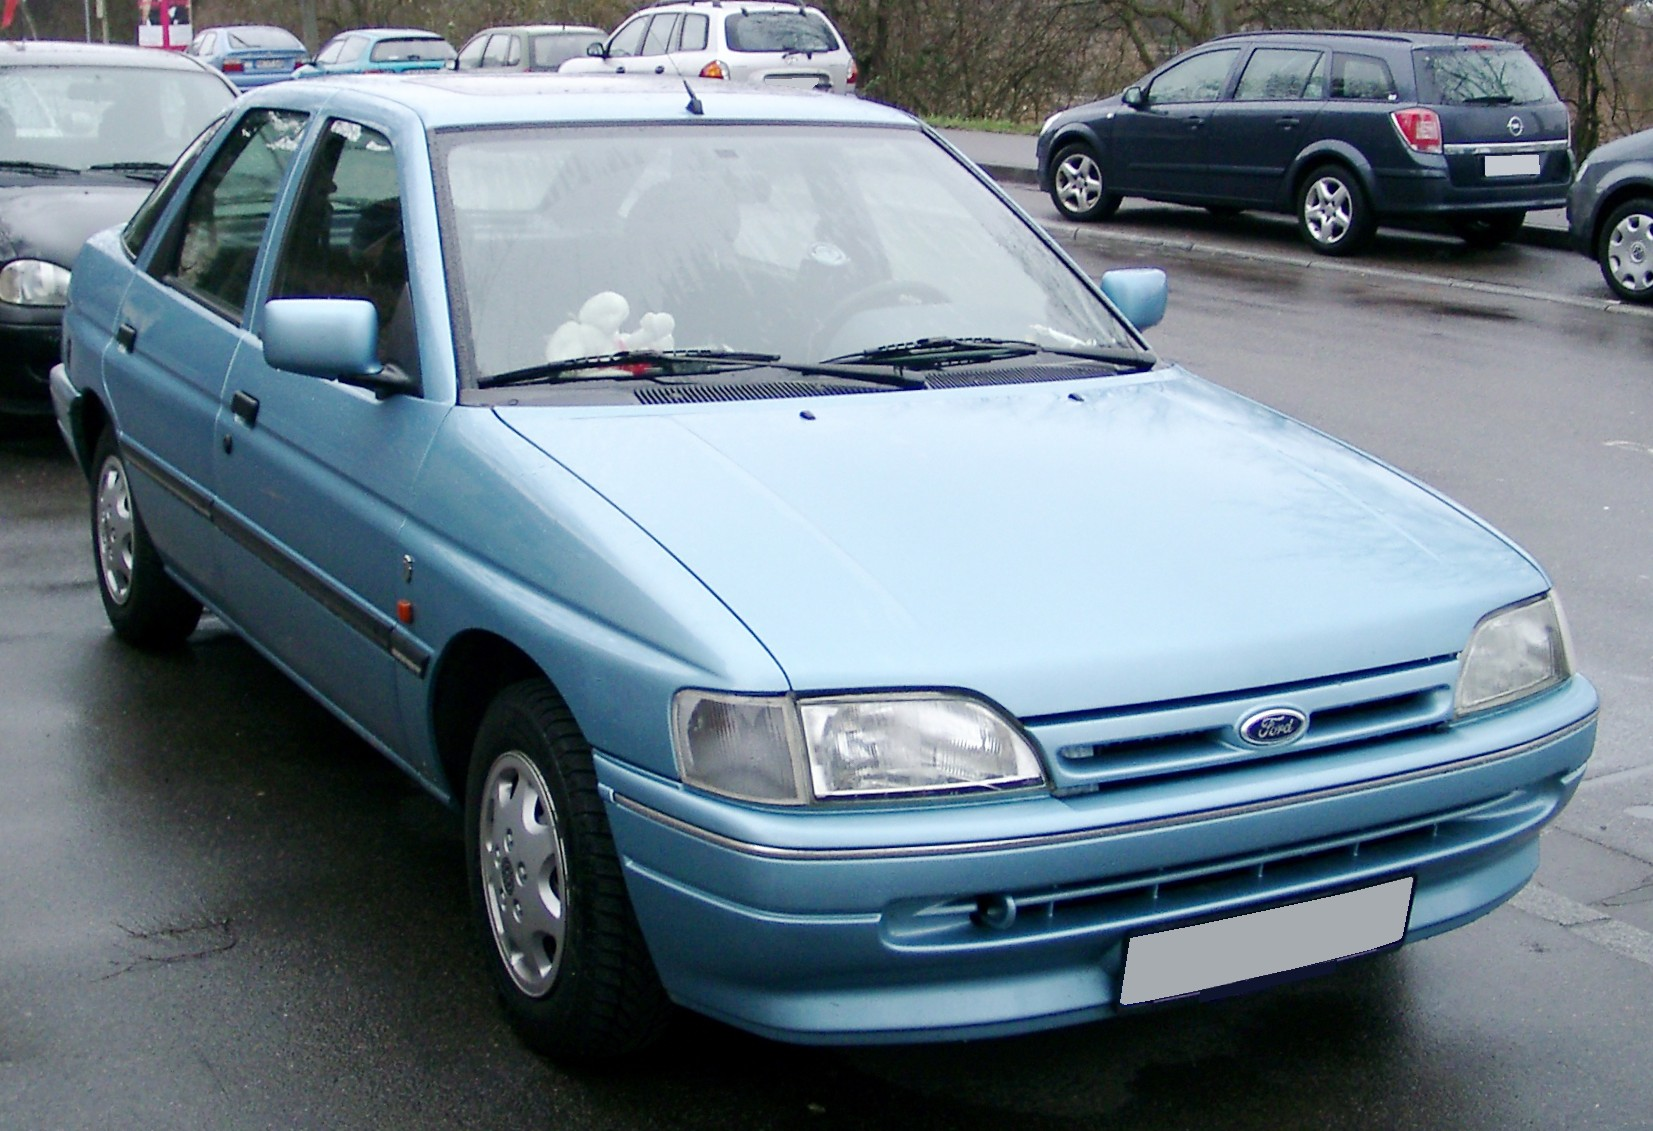 Ford Escort V Restyling 2 1995 - 2000 Cabriolet #4